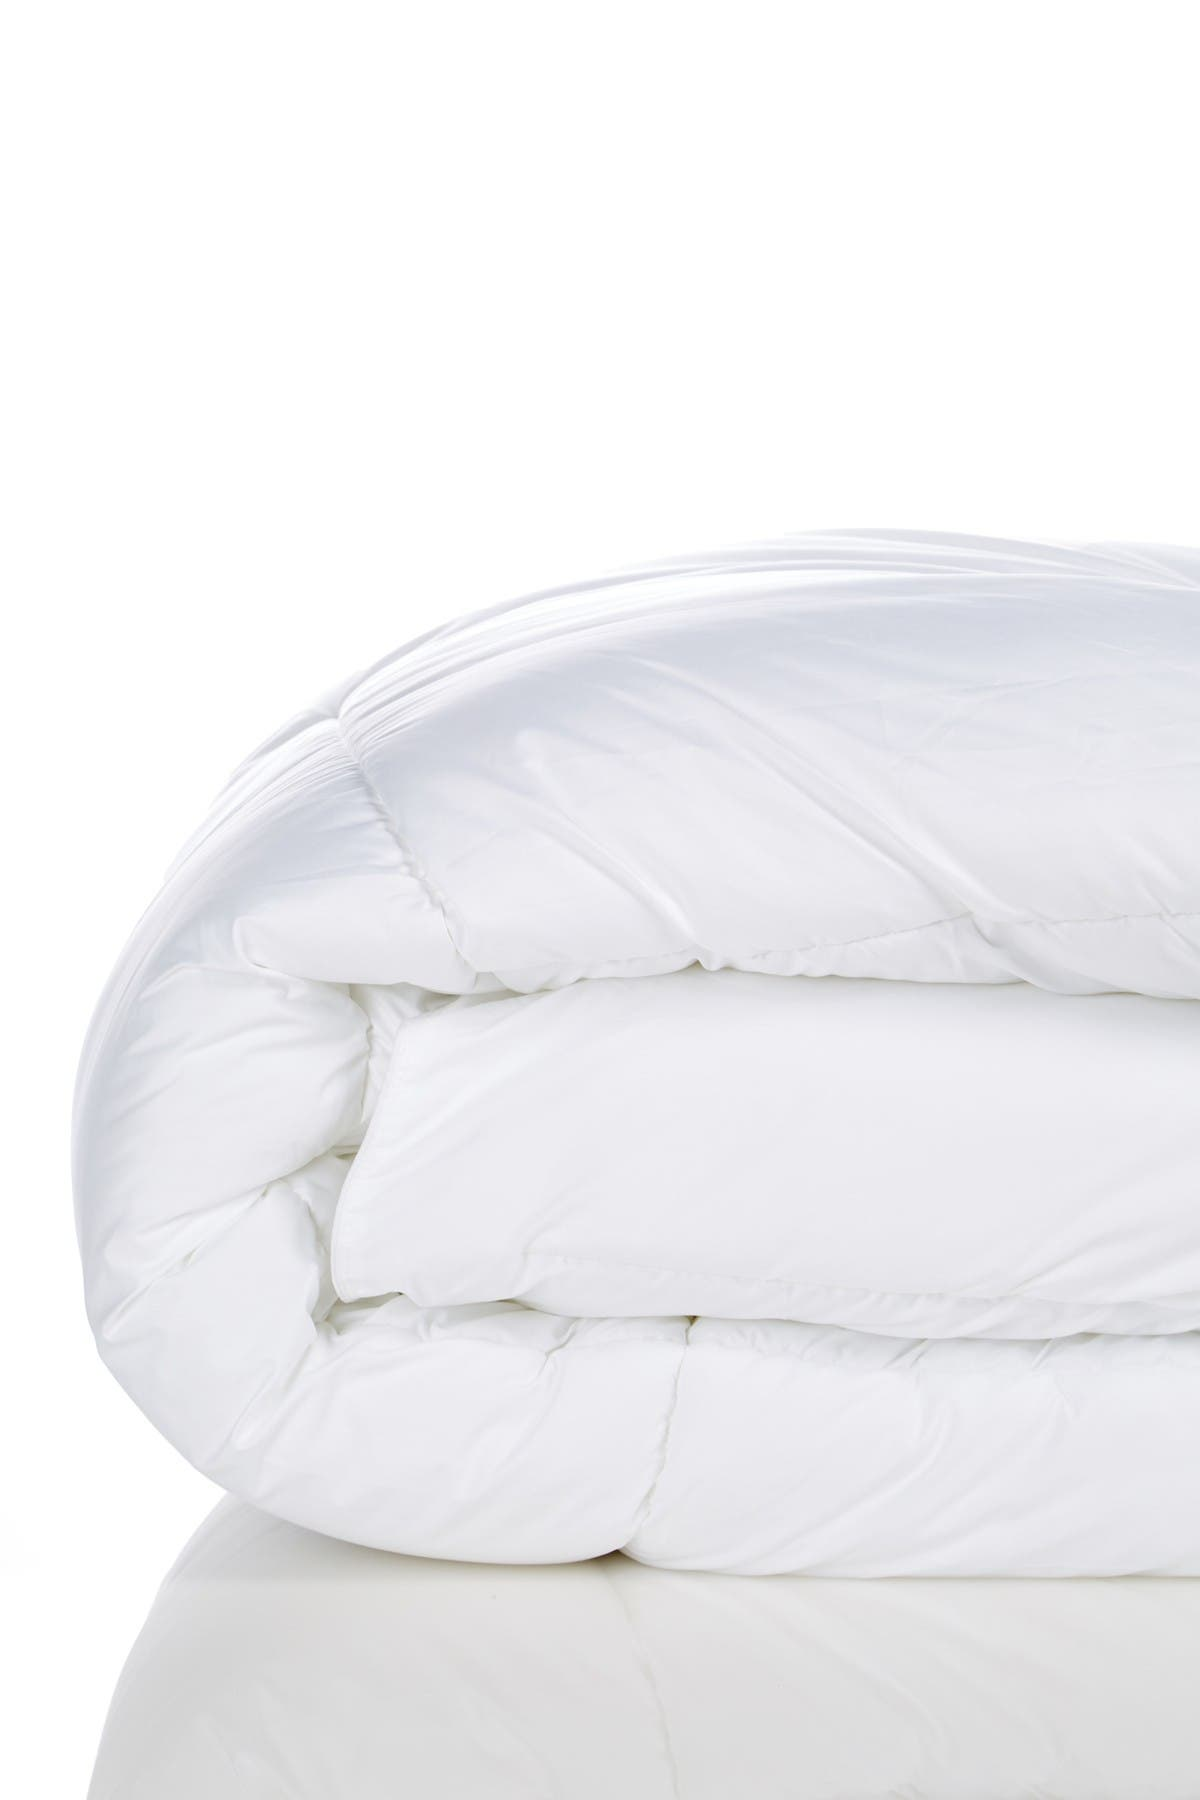 Image of Nordstrom Rack Twin Down Alternative Comforter - White